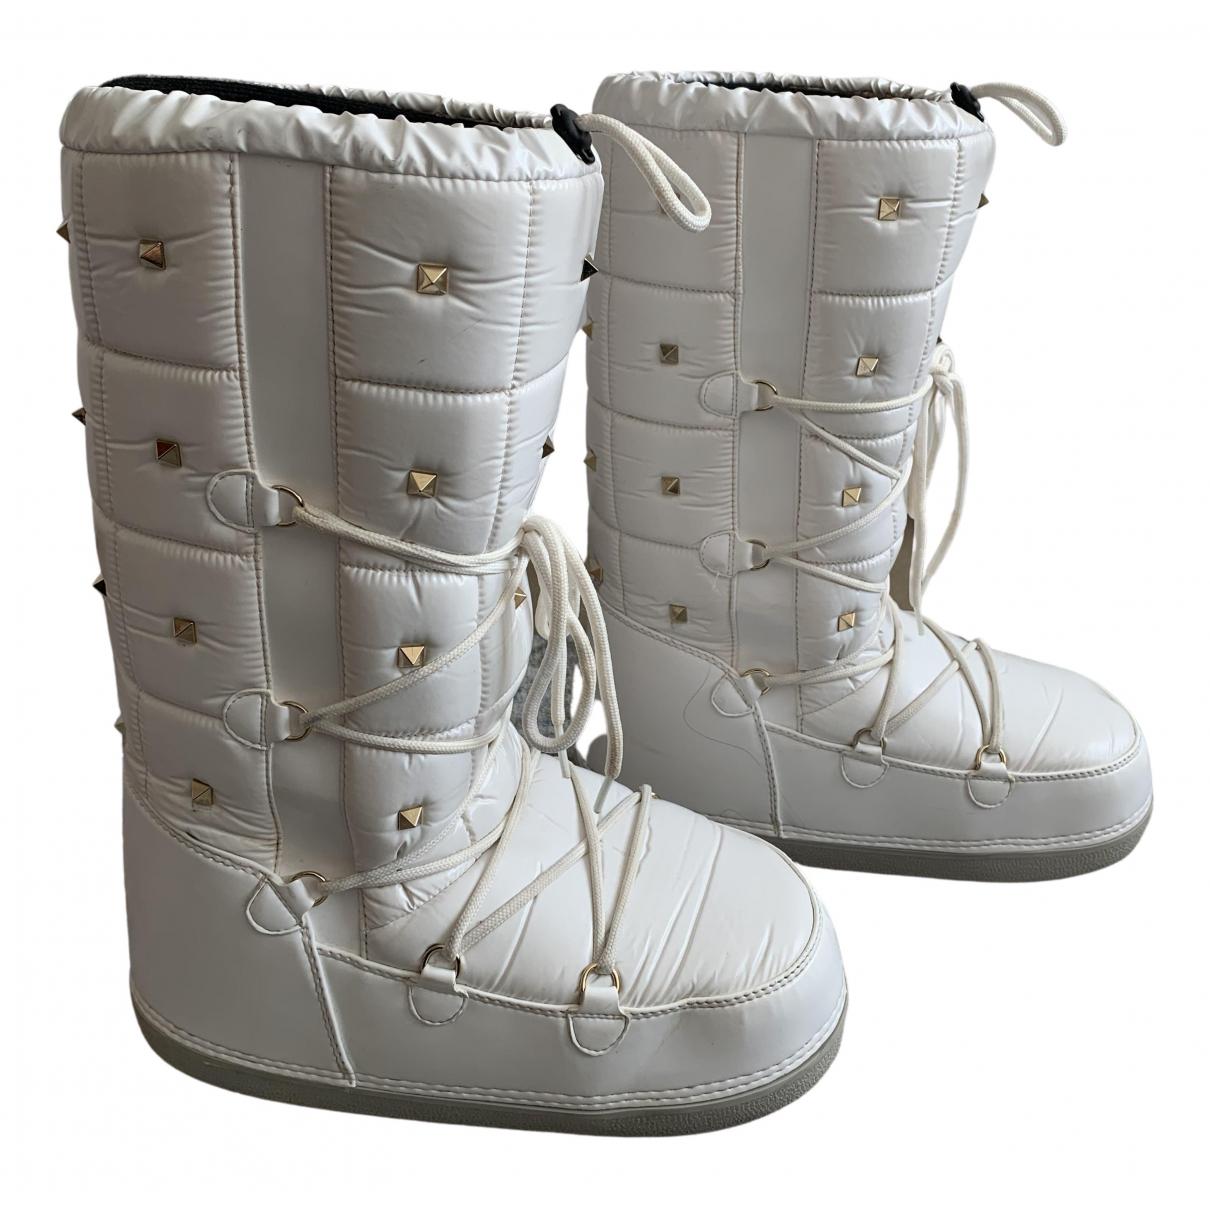 Valentino Garavani Rockstud White Boots for Women 41 EU